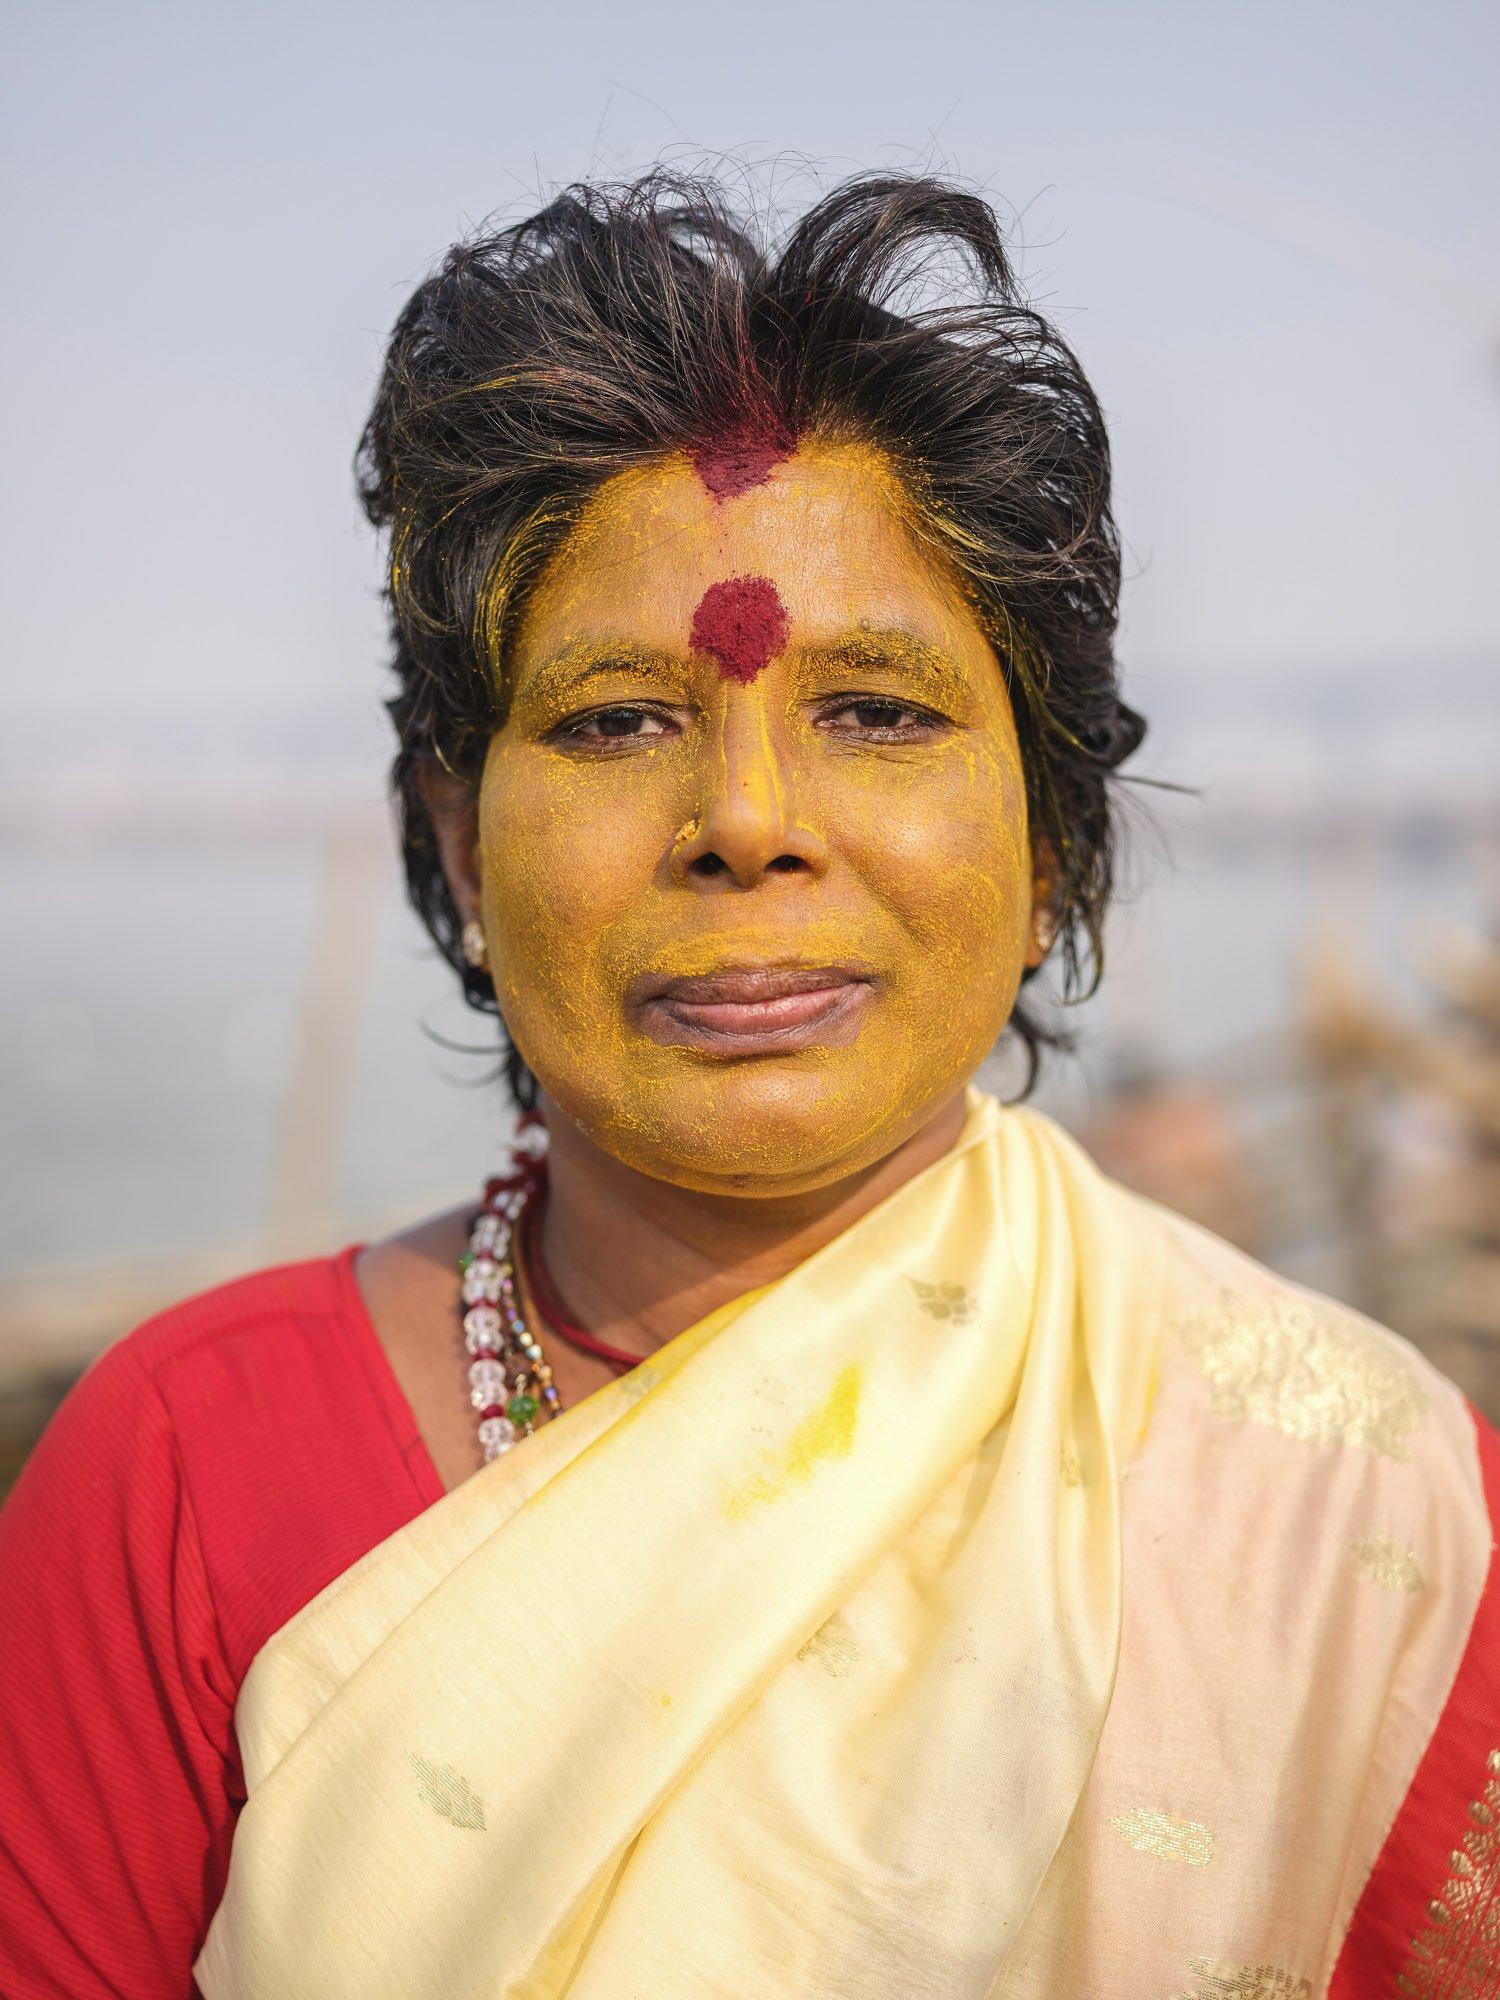 india Kumbh mela Commercial Editorial Portraiture Documentary Photographer fujifilm Director Singapore Jose Jeuland photography fashion woman